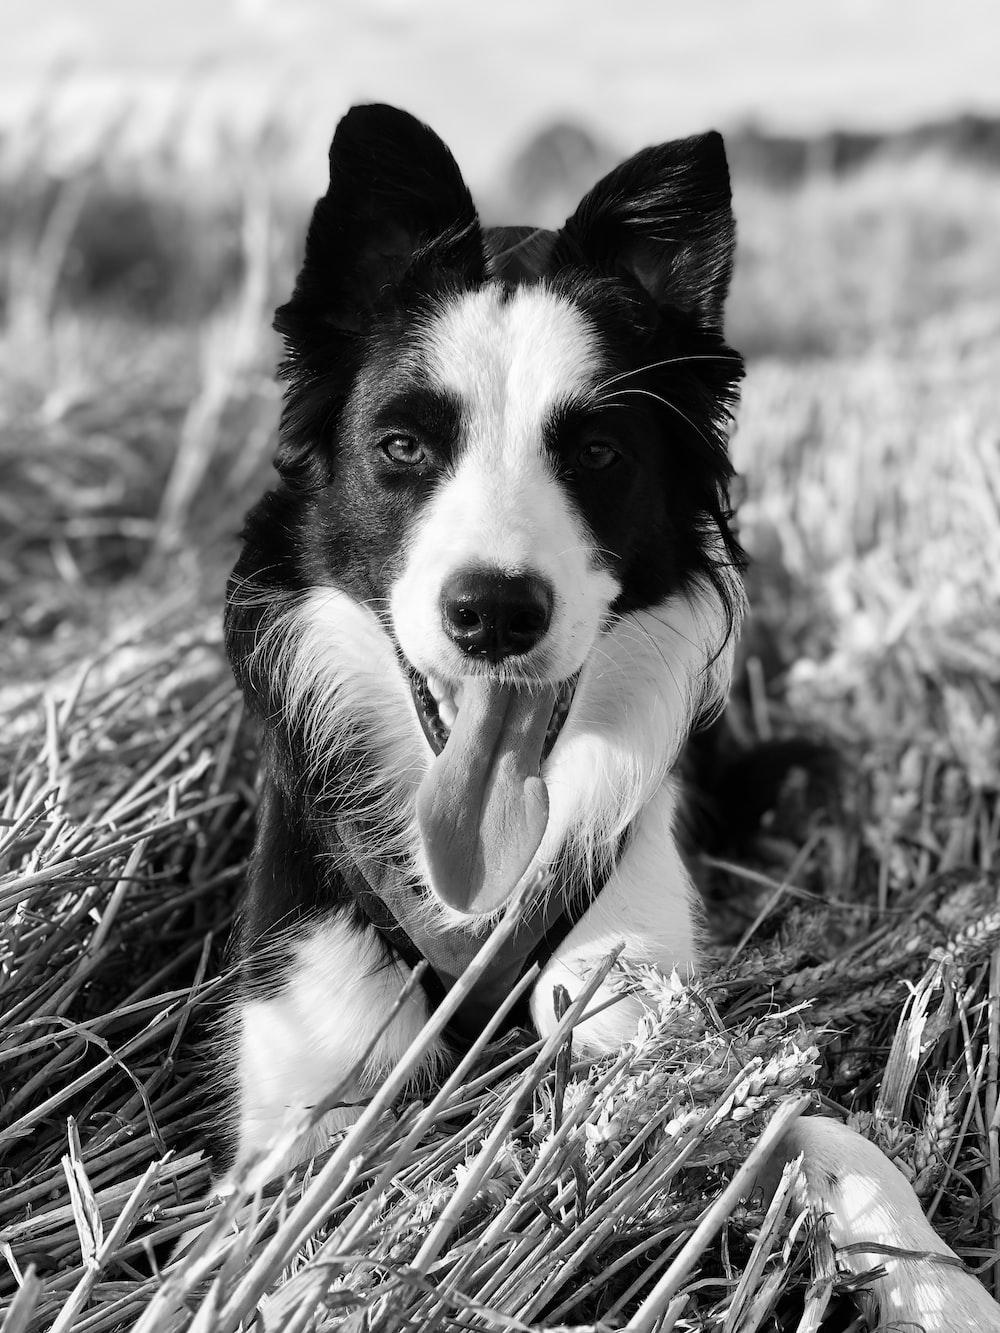 monochrome photo of dog on grass